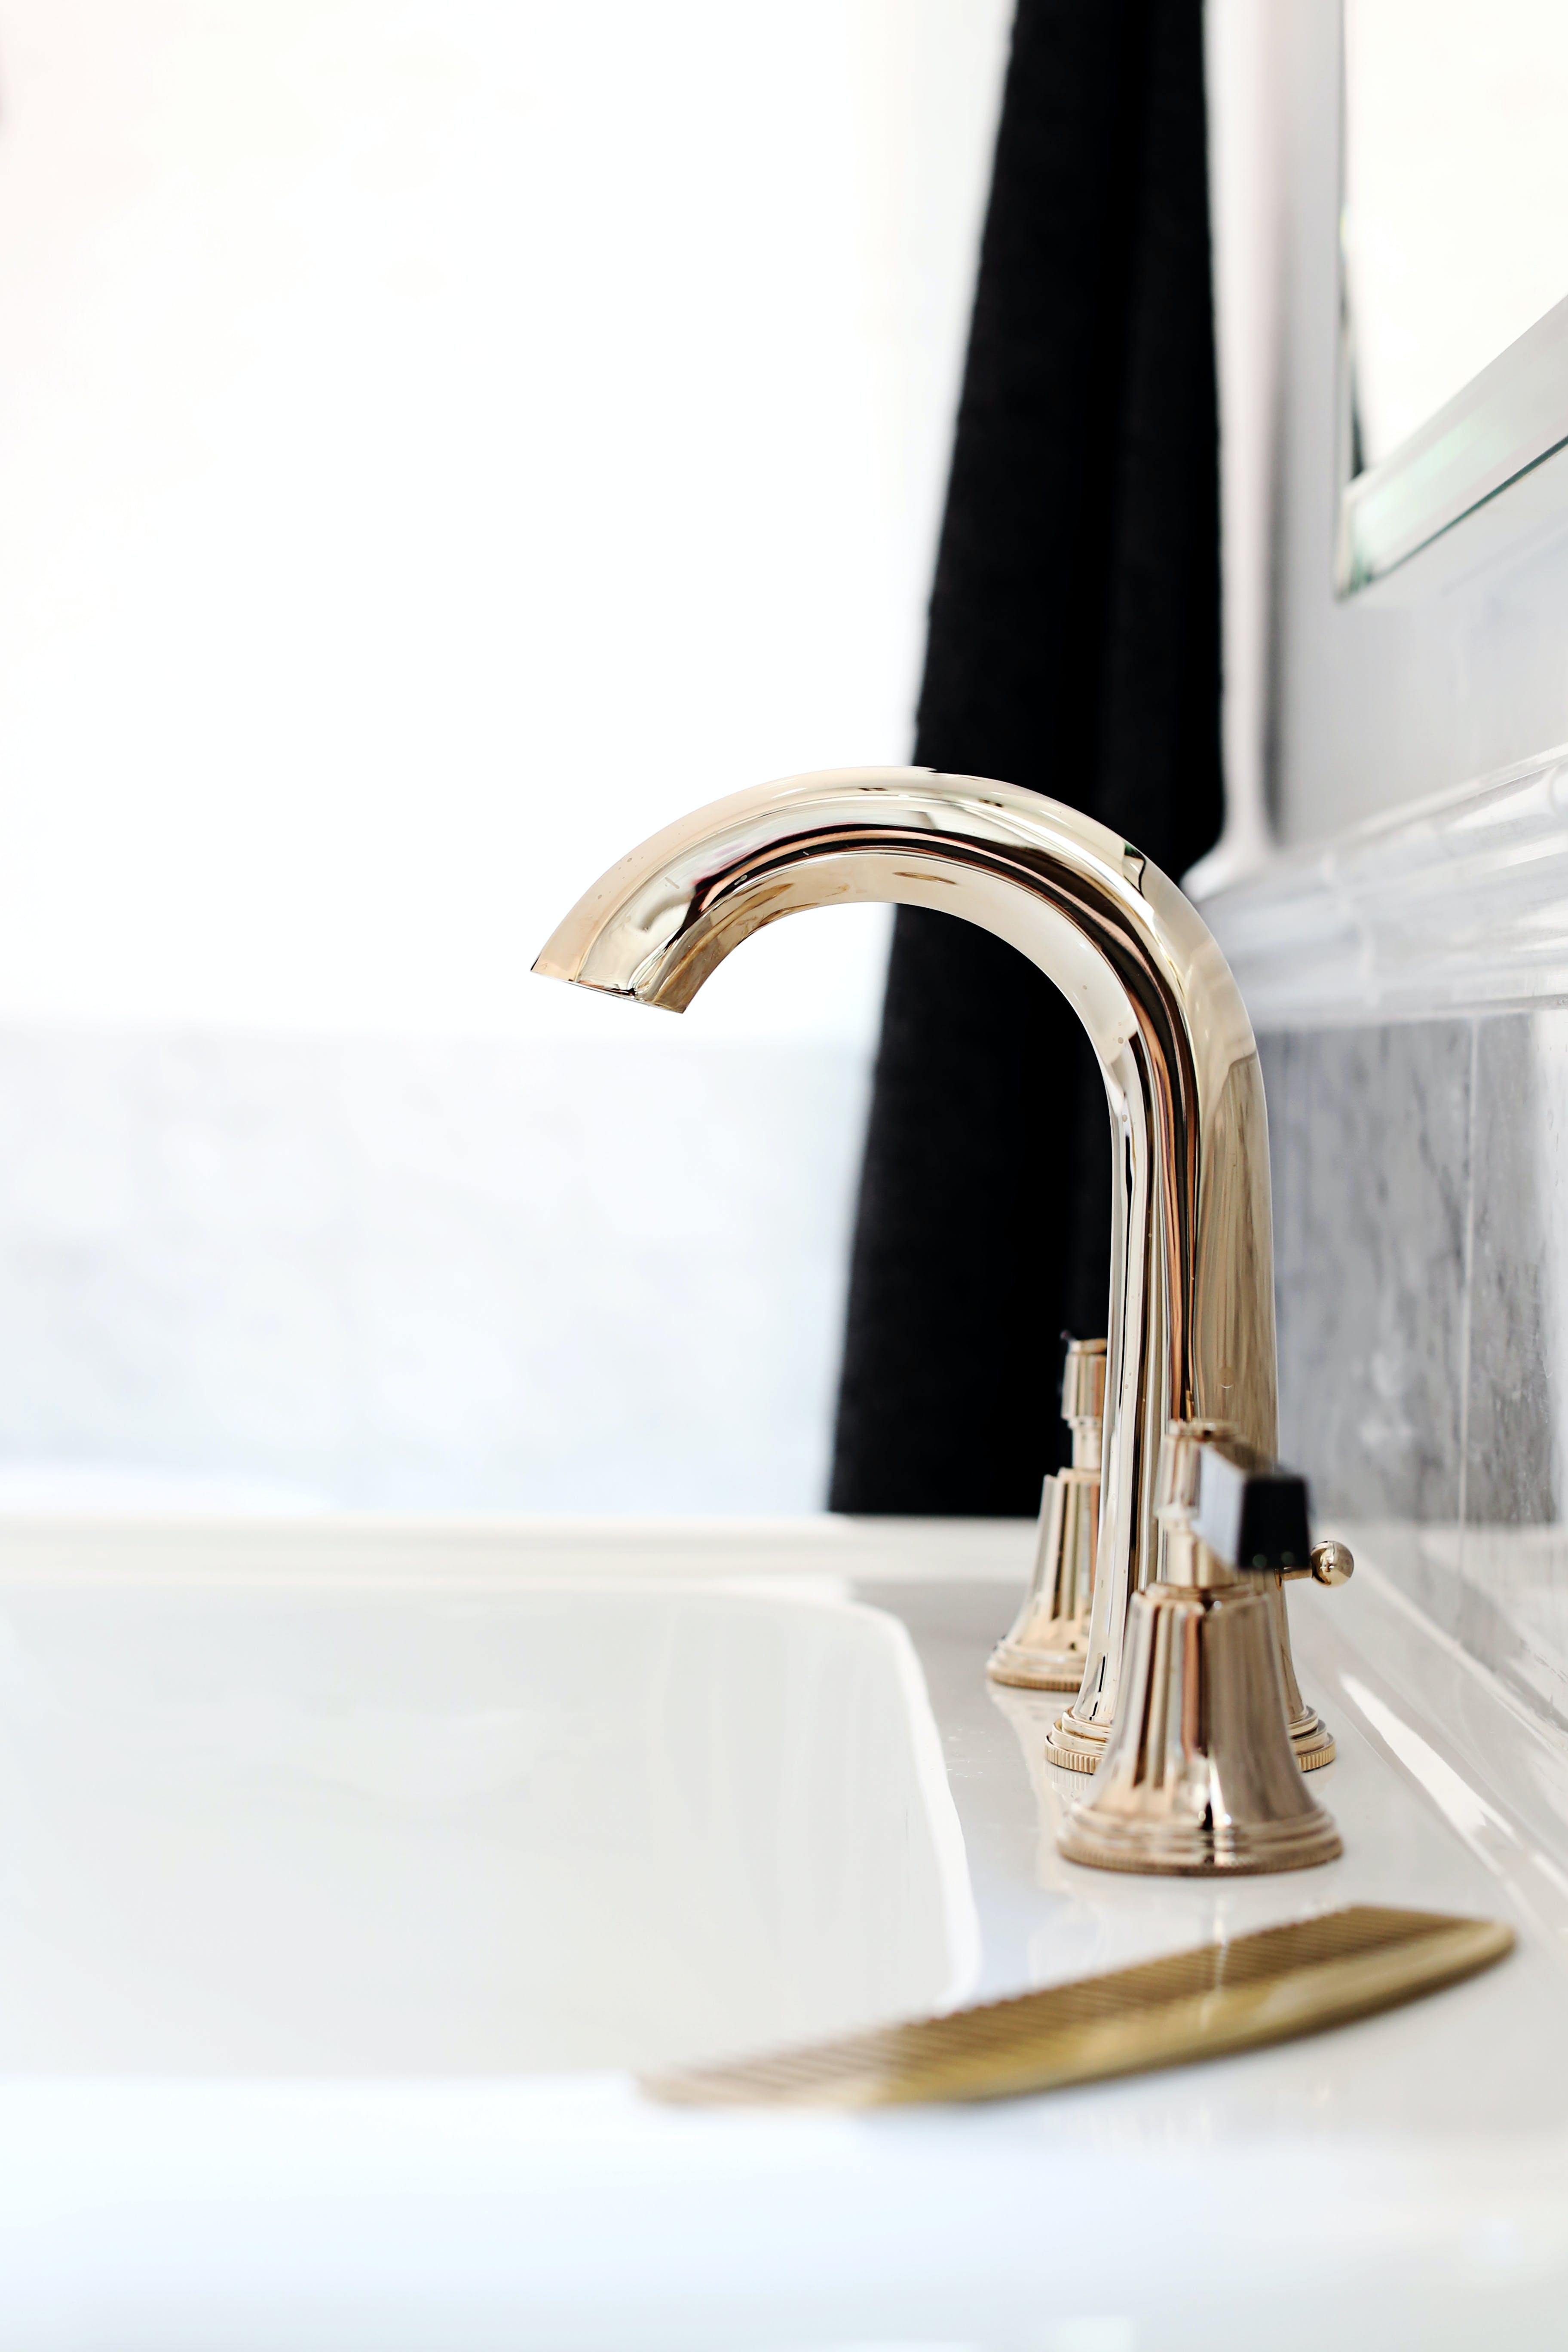 Luxury Art Deco taps mounted on a white basin